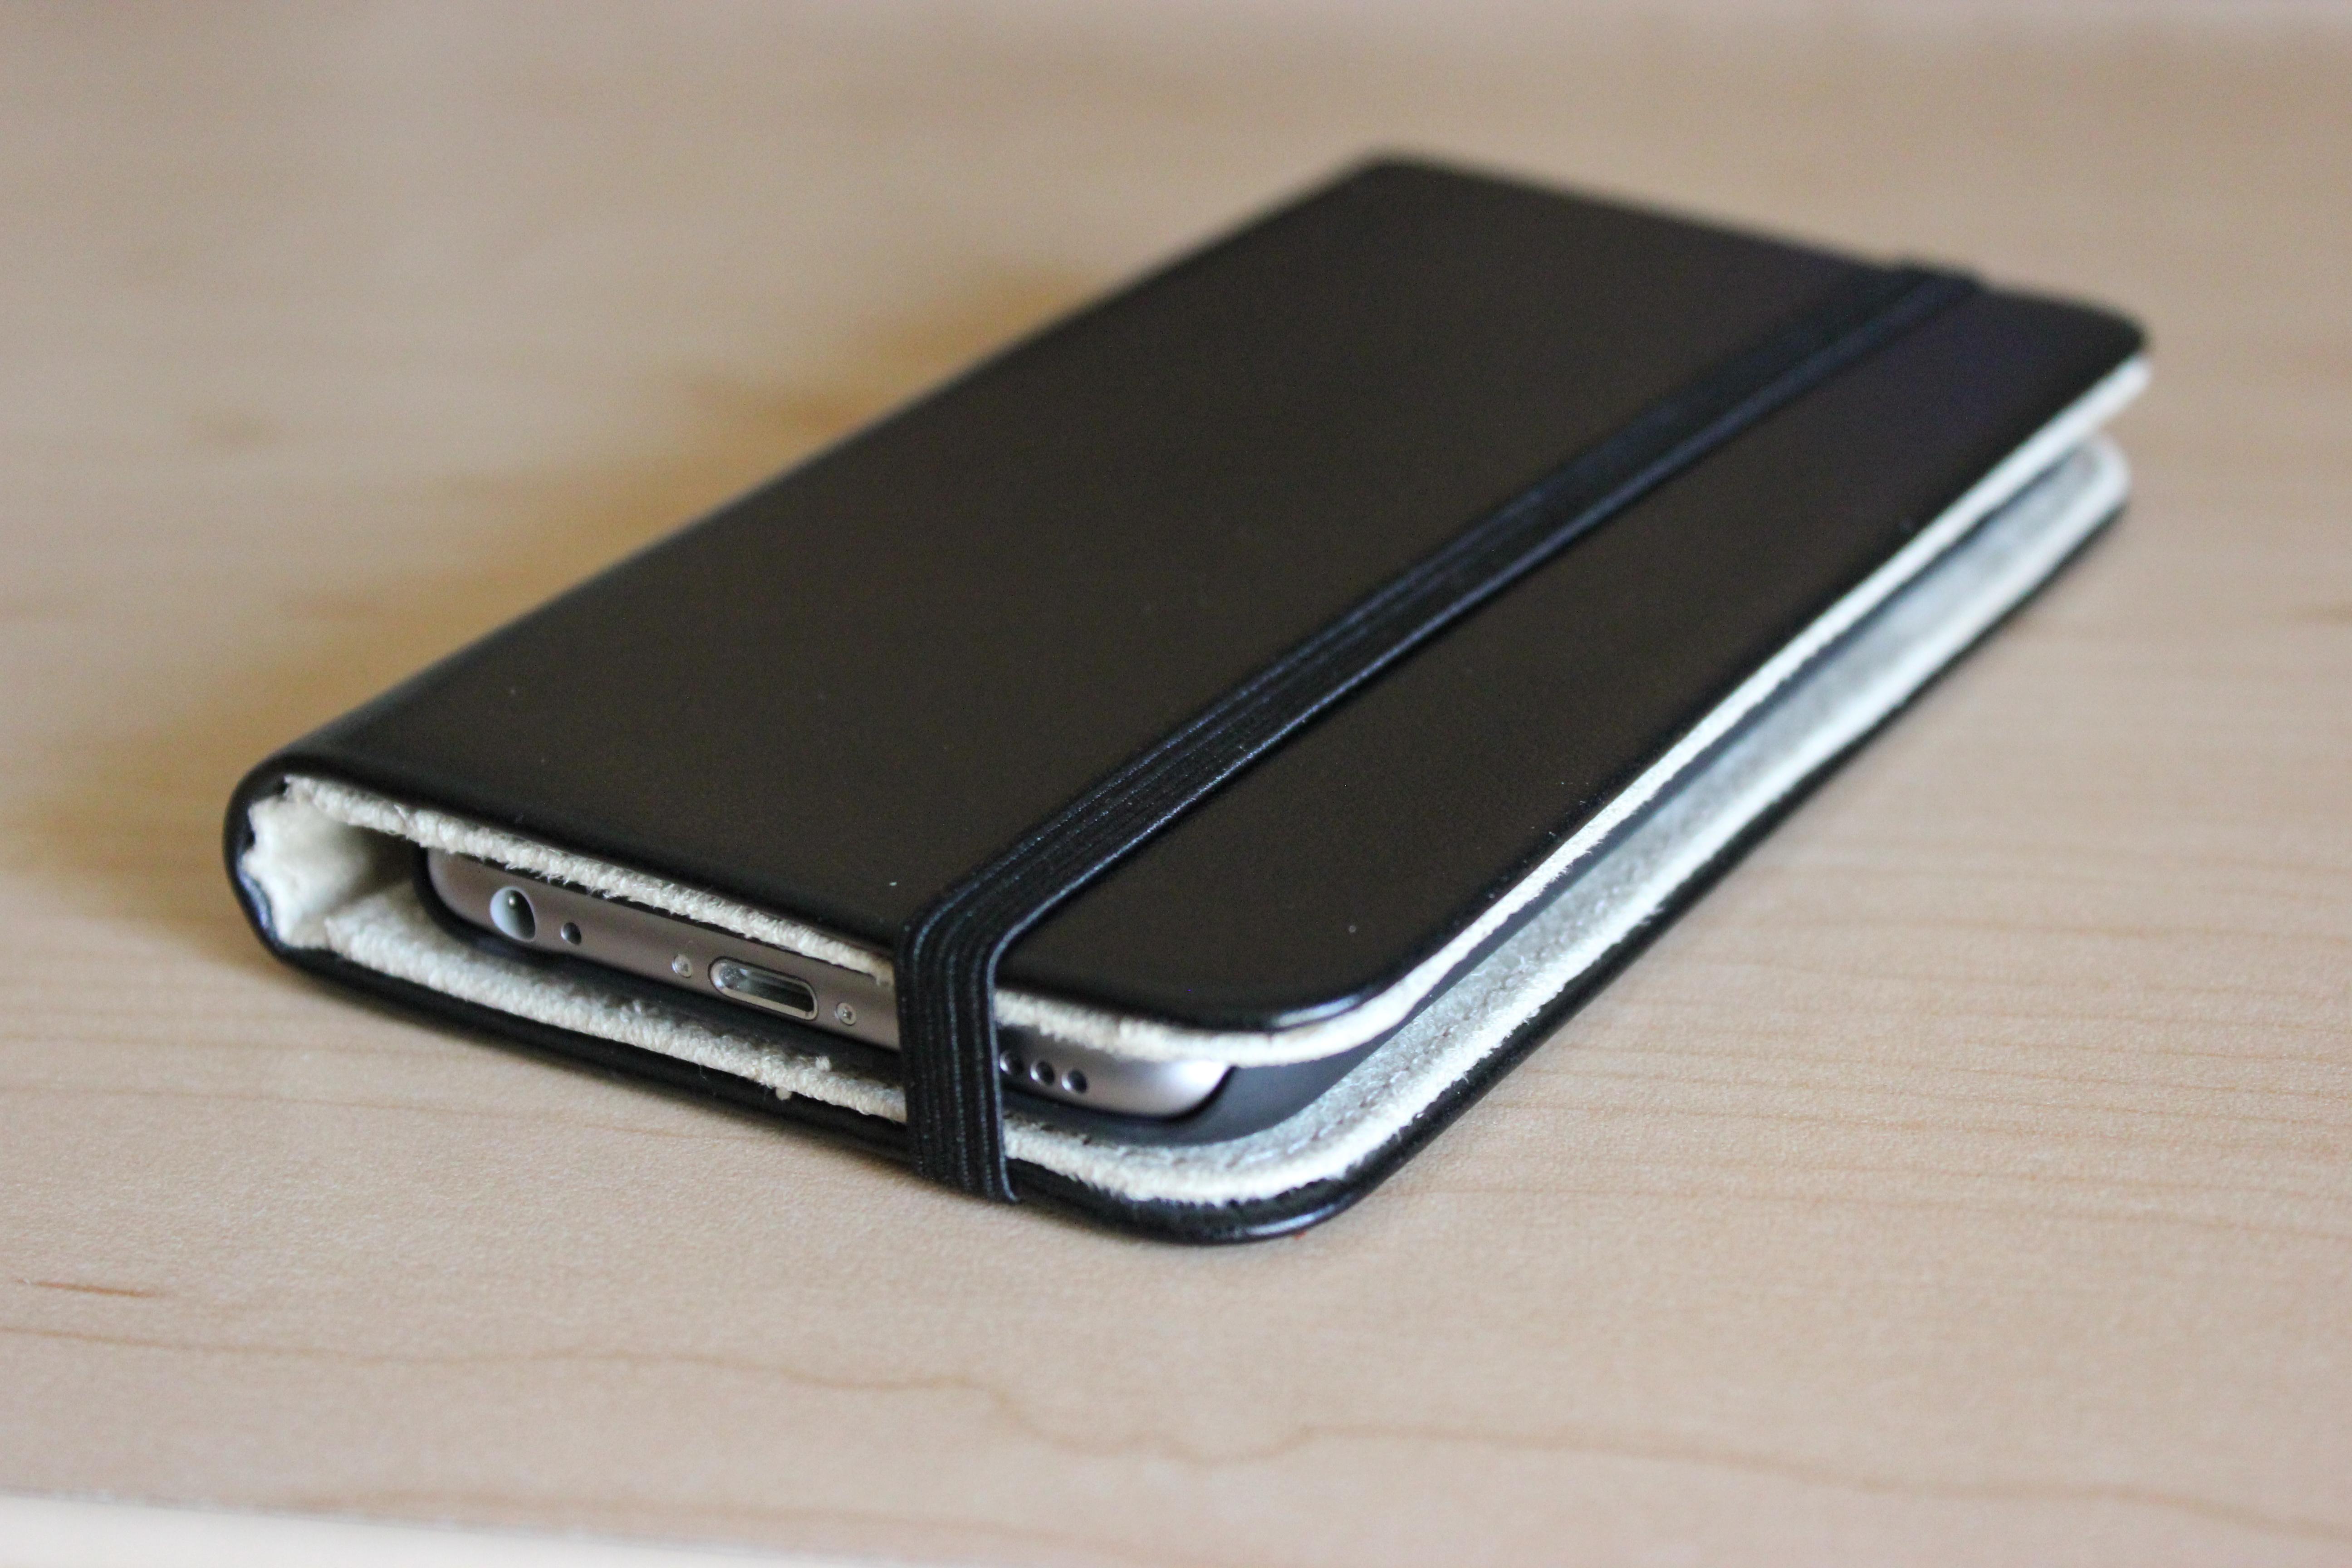 Moleskine Iphone  Case Review